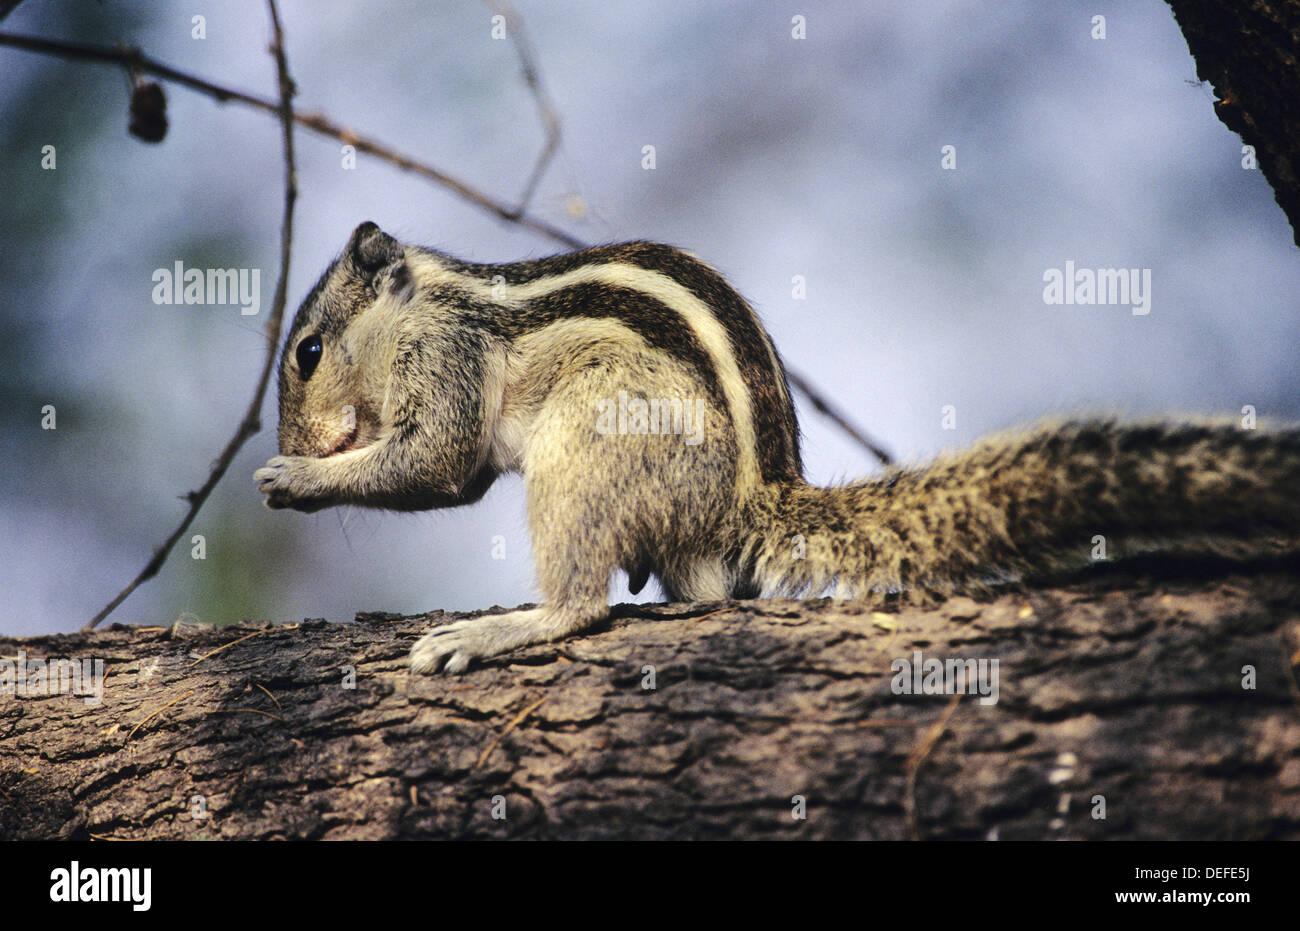 Three Striped Palm Squirrel (Funambulus palmarum) at Keoladev National Park. Bharatpur. Rajasthan. India - Stock Image